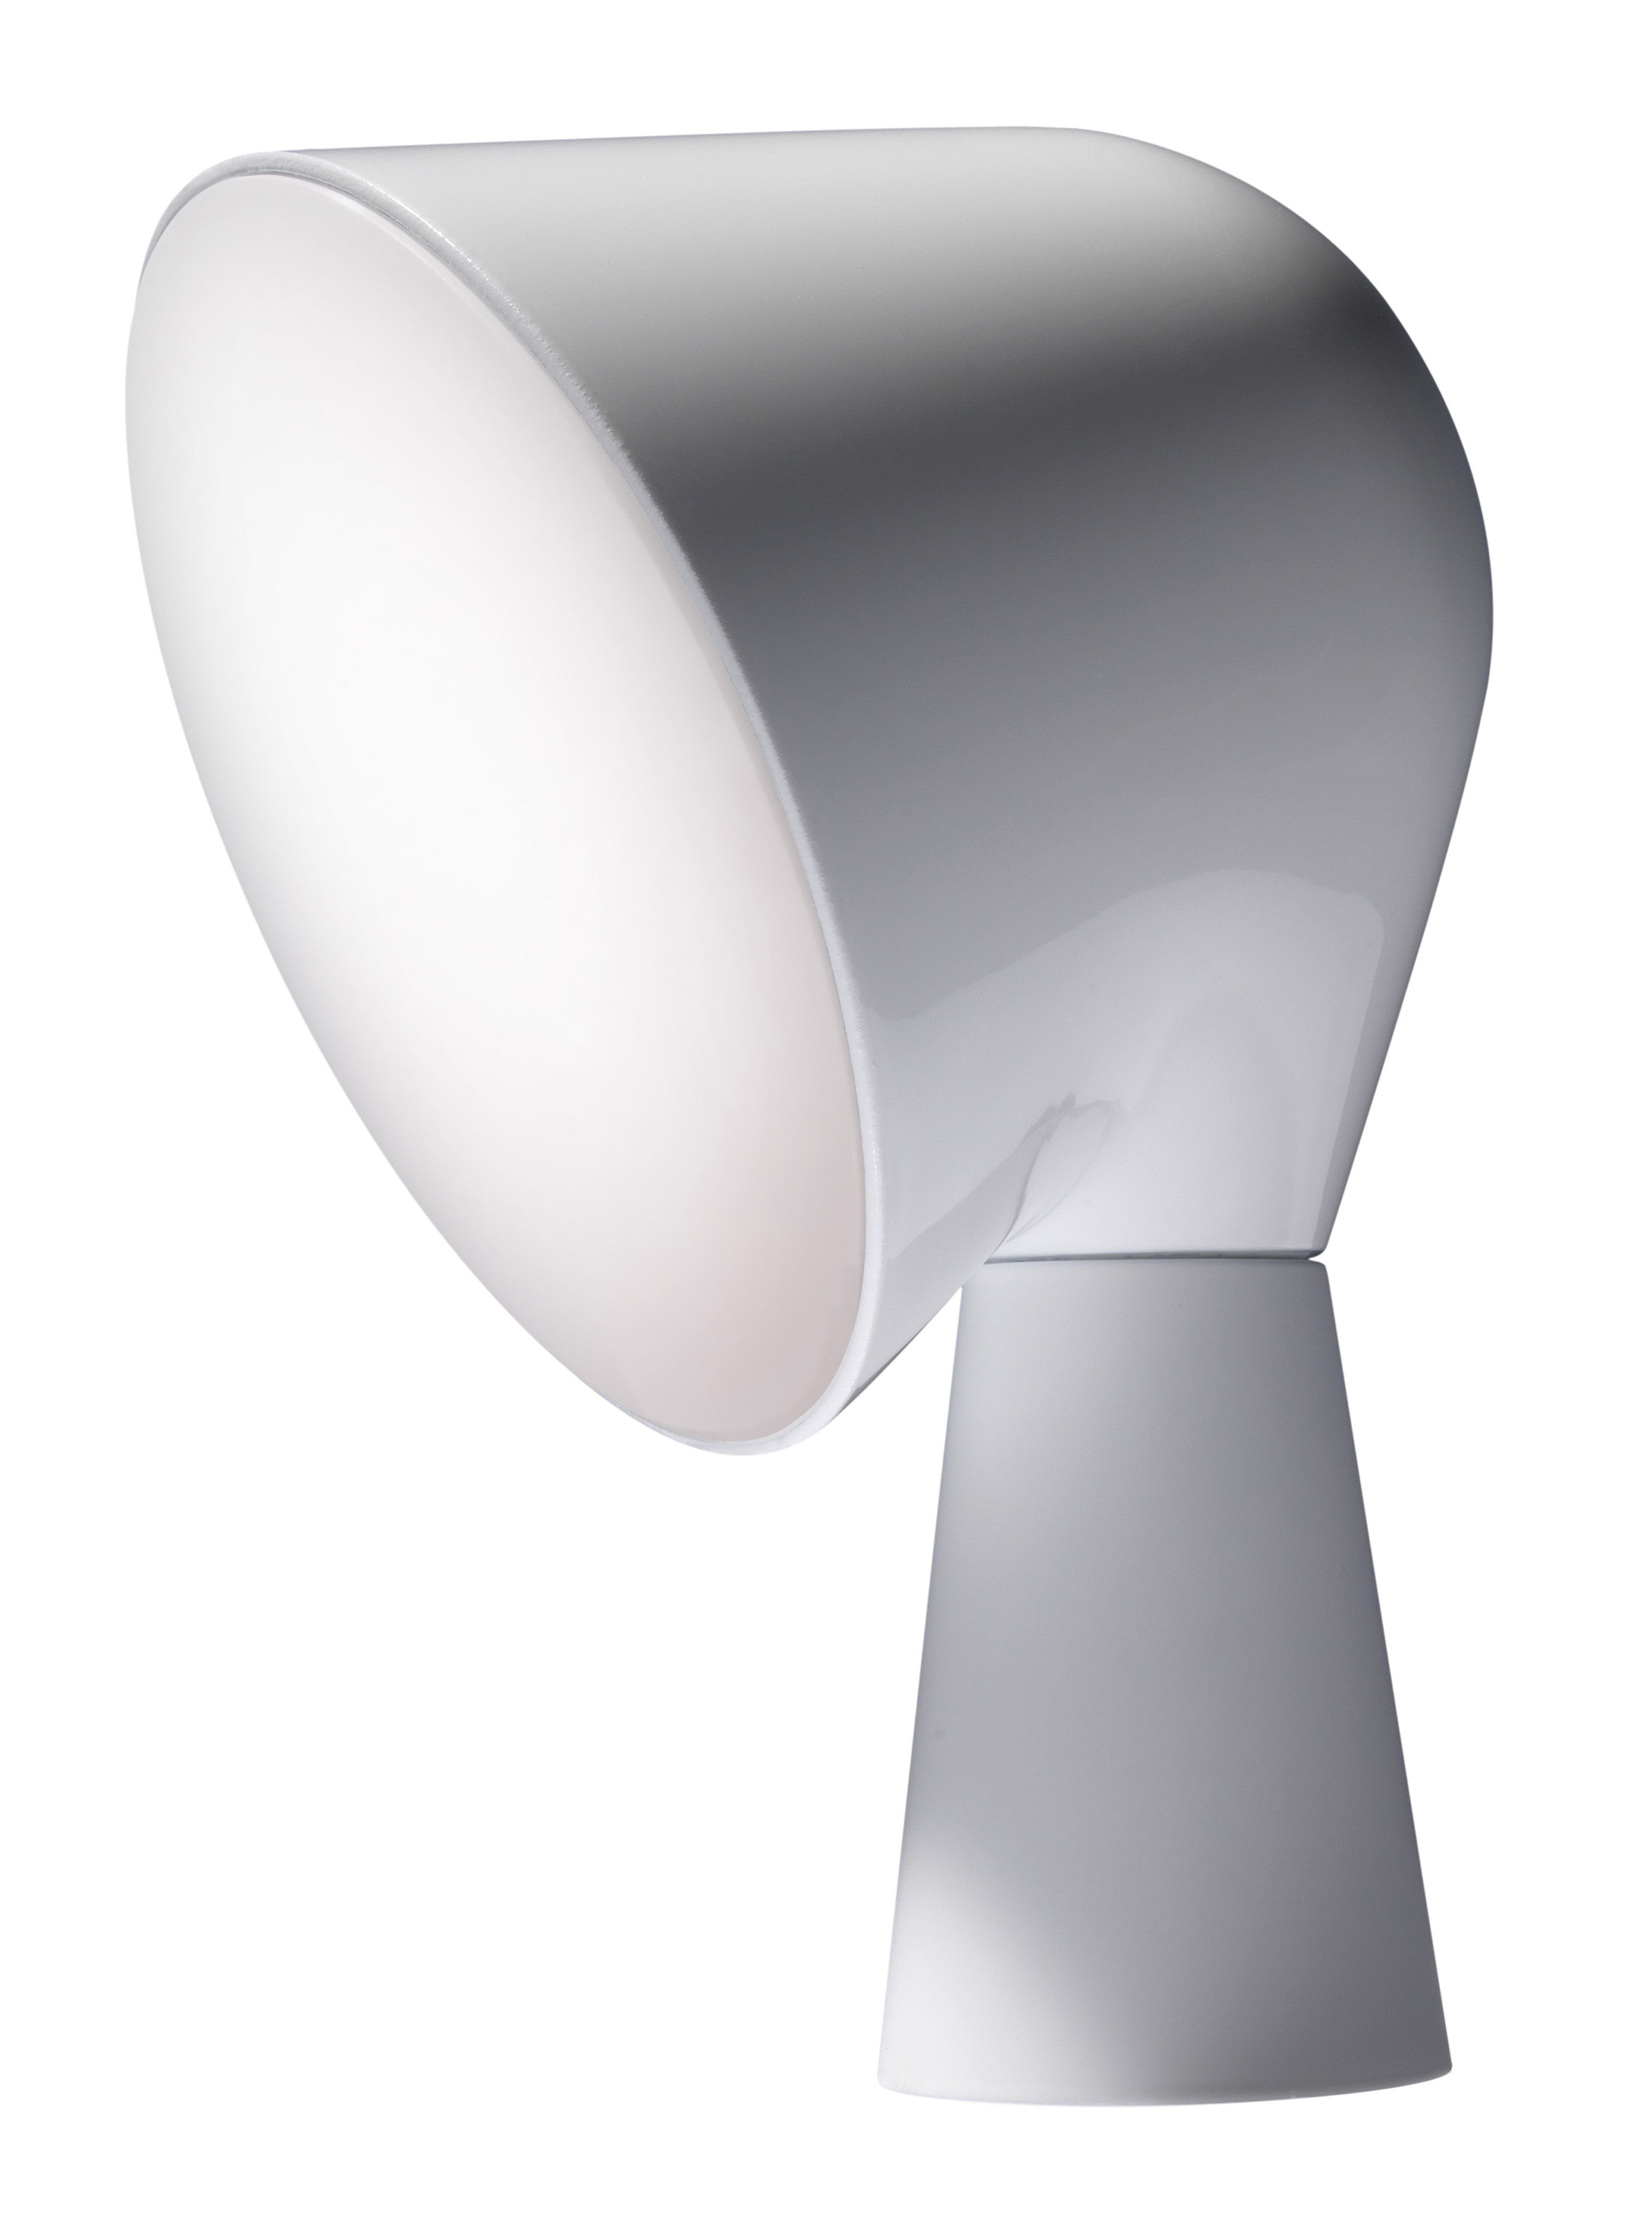 Luminaire - Lampes de table - Lampe de table Binic - Foscarini - Blanc - ABS, Polycarbonate